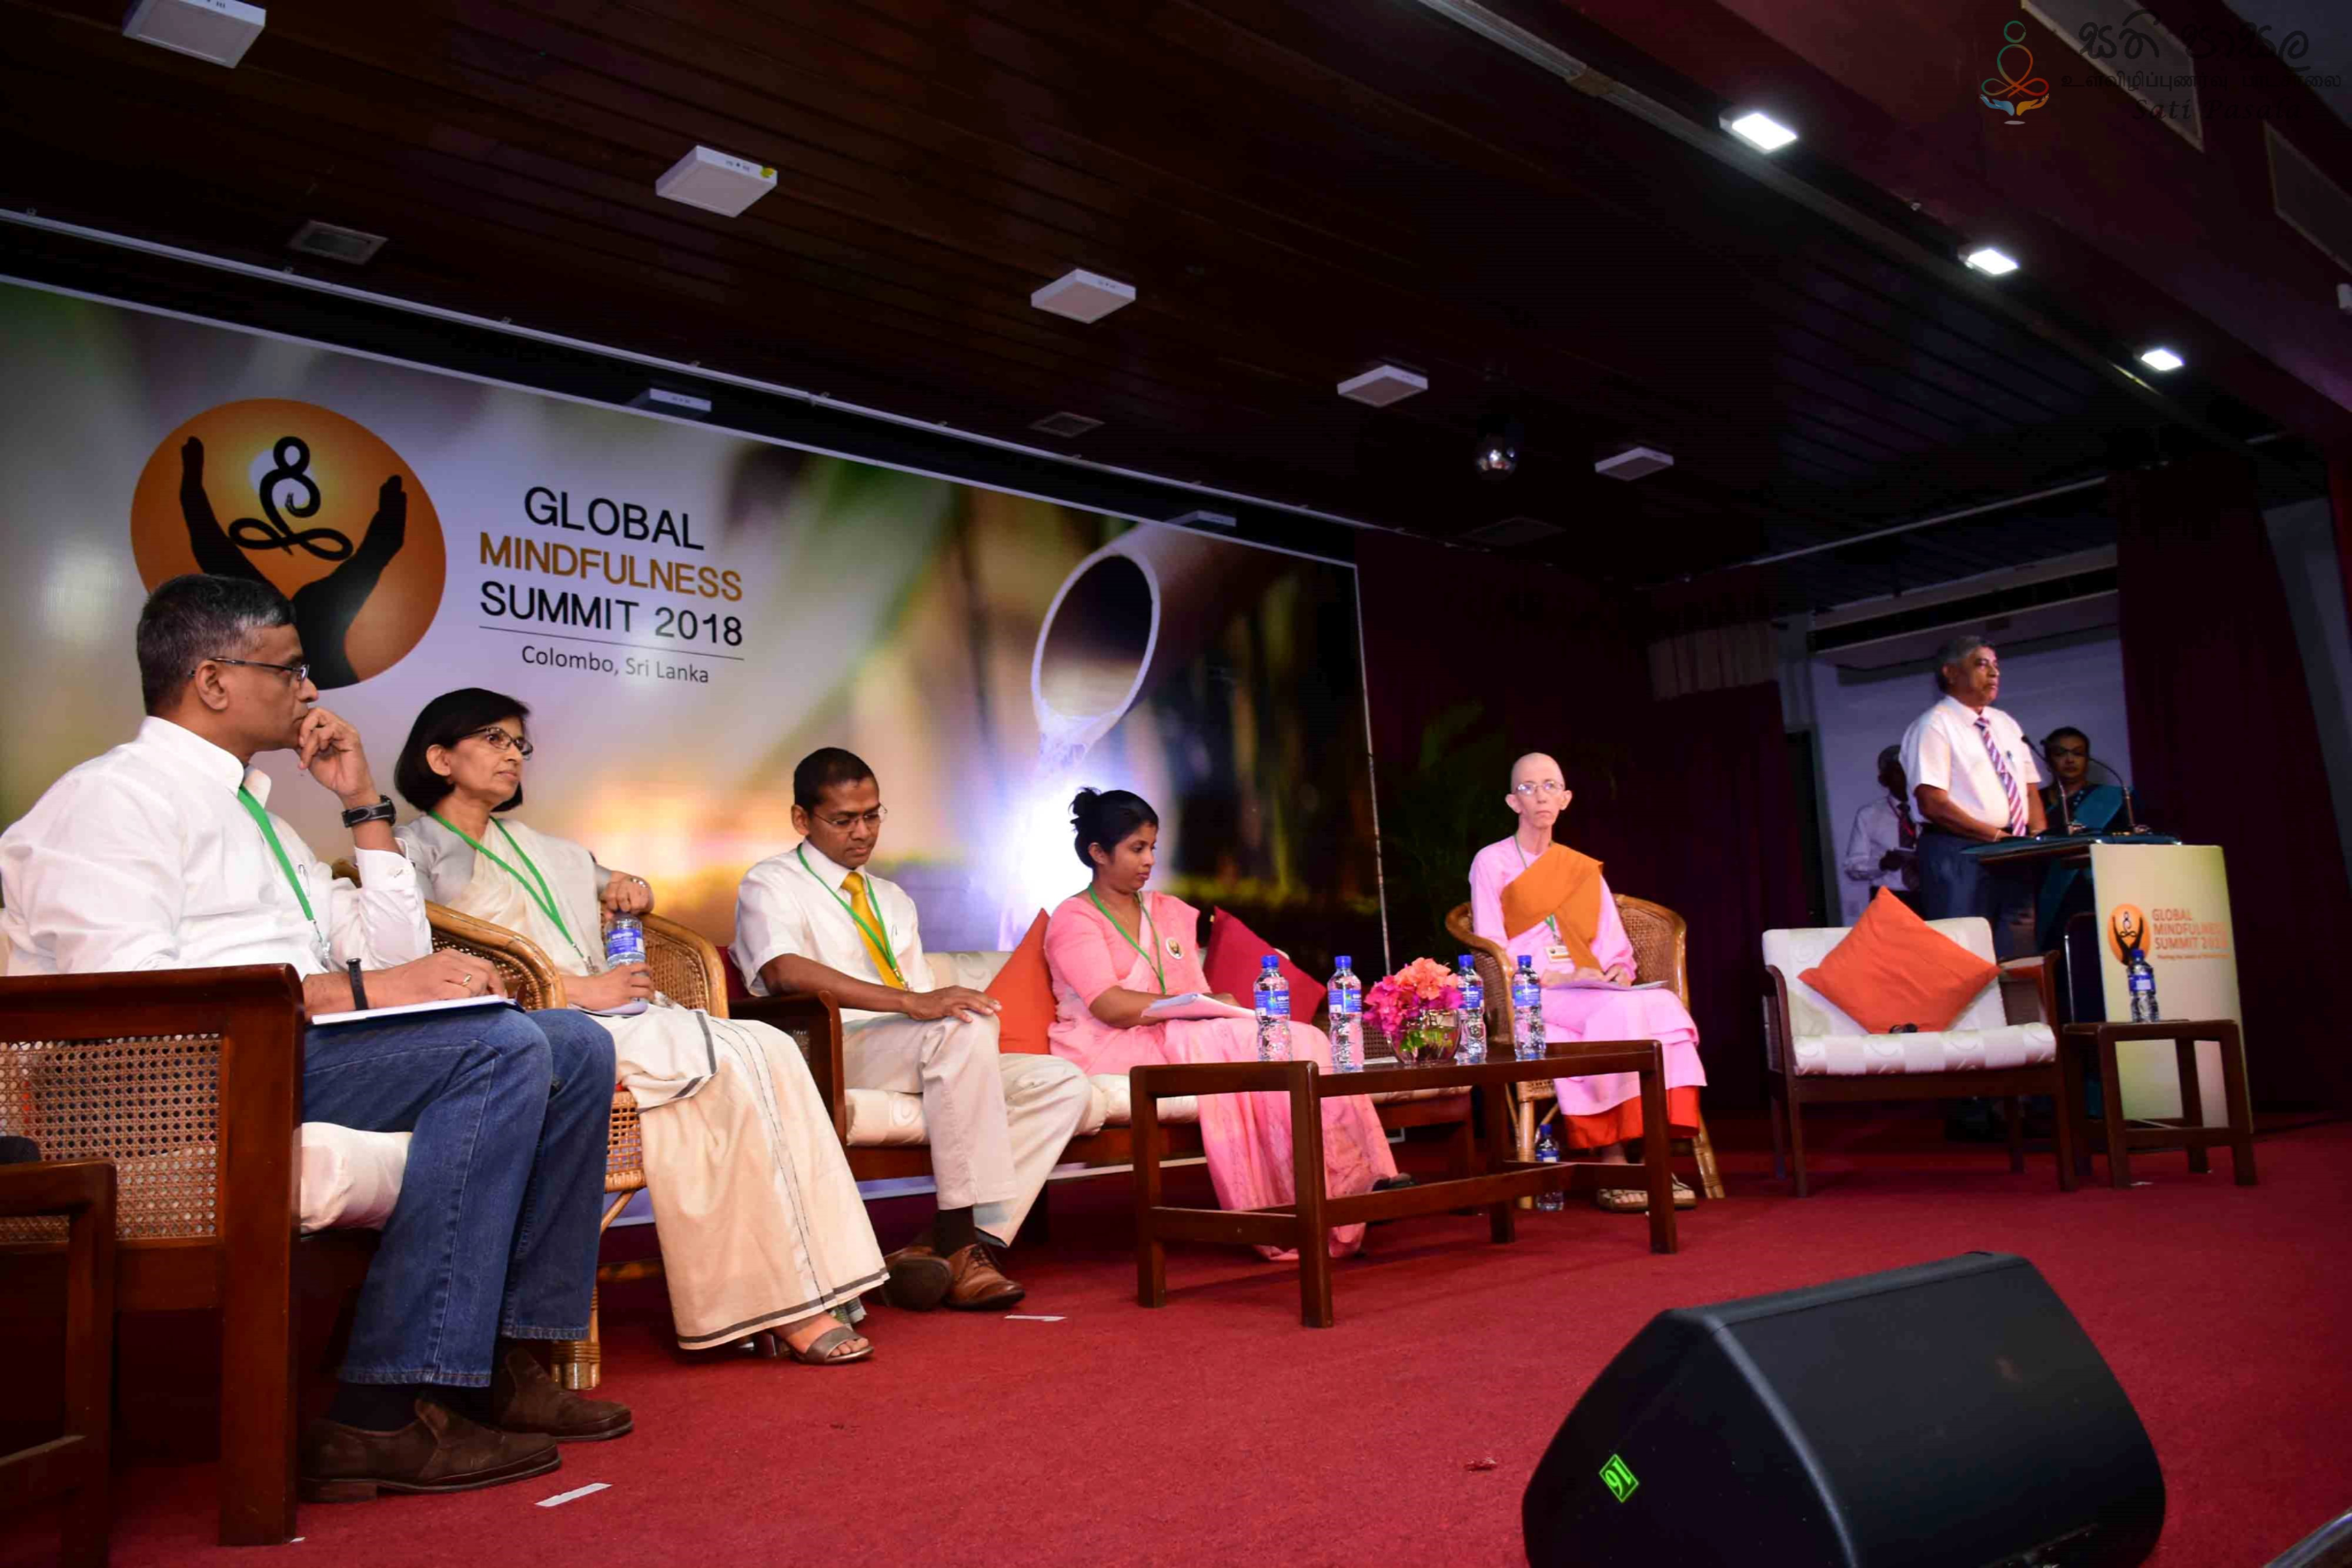 Global Mindfulness Summit 2018 - Day1 (27)